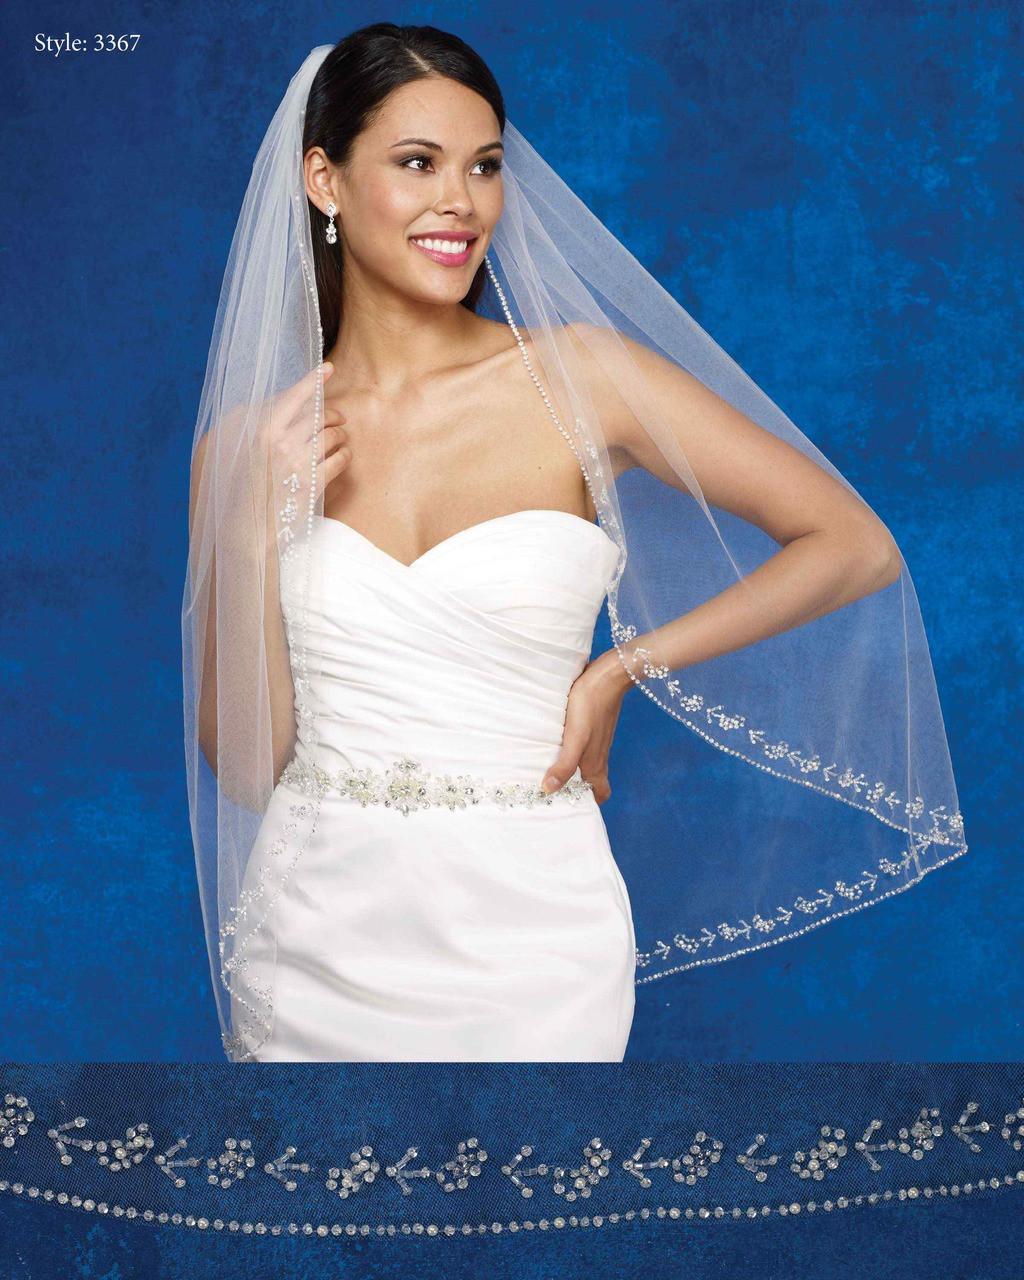 Marionat Bridal Veils 3367- The Bridal Veil Company - Fingertip Beaded Edge